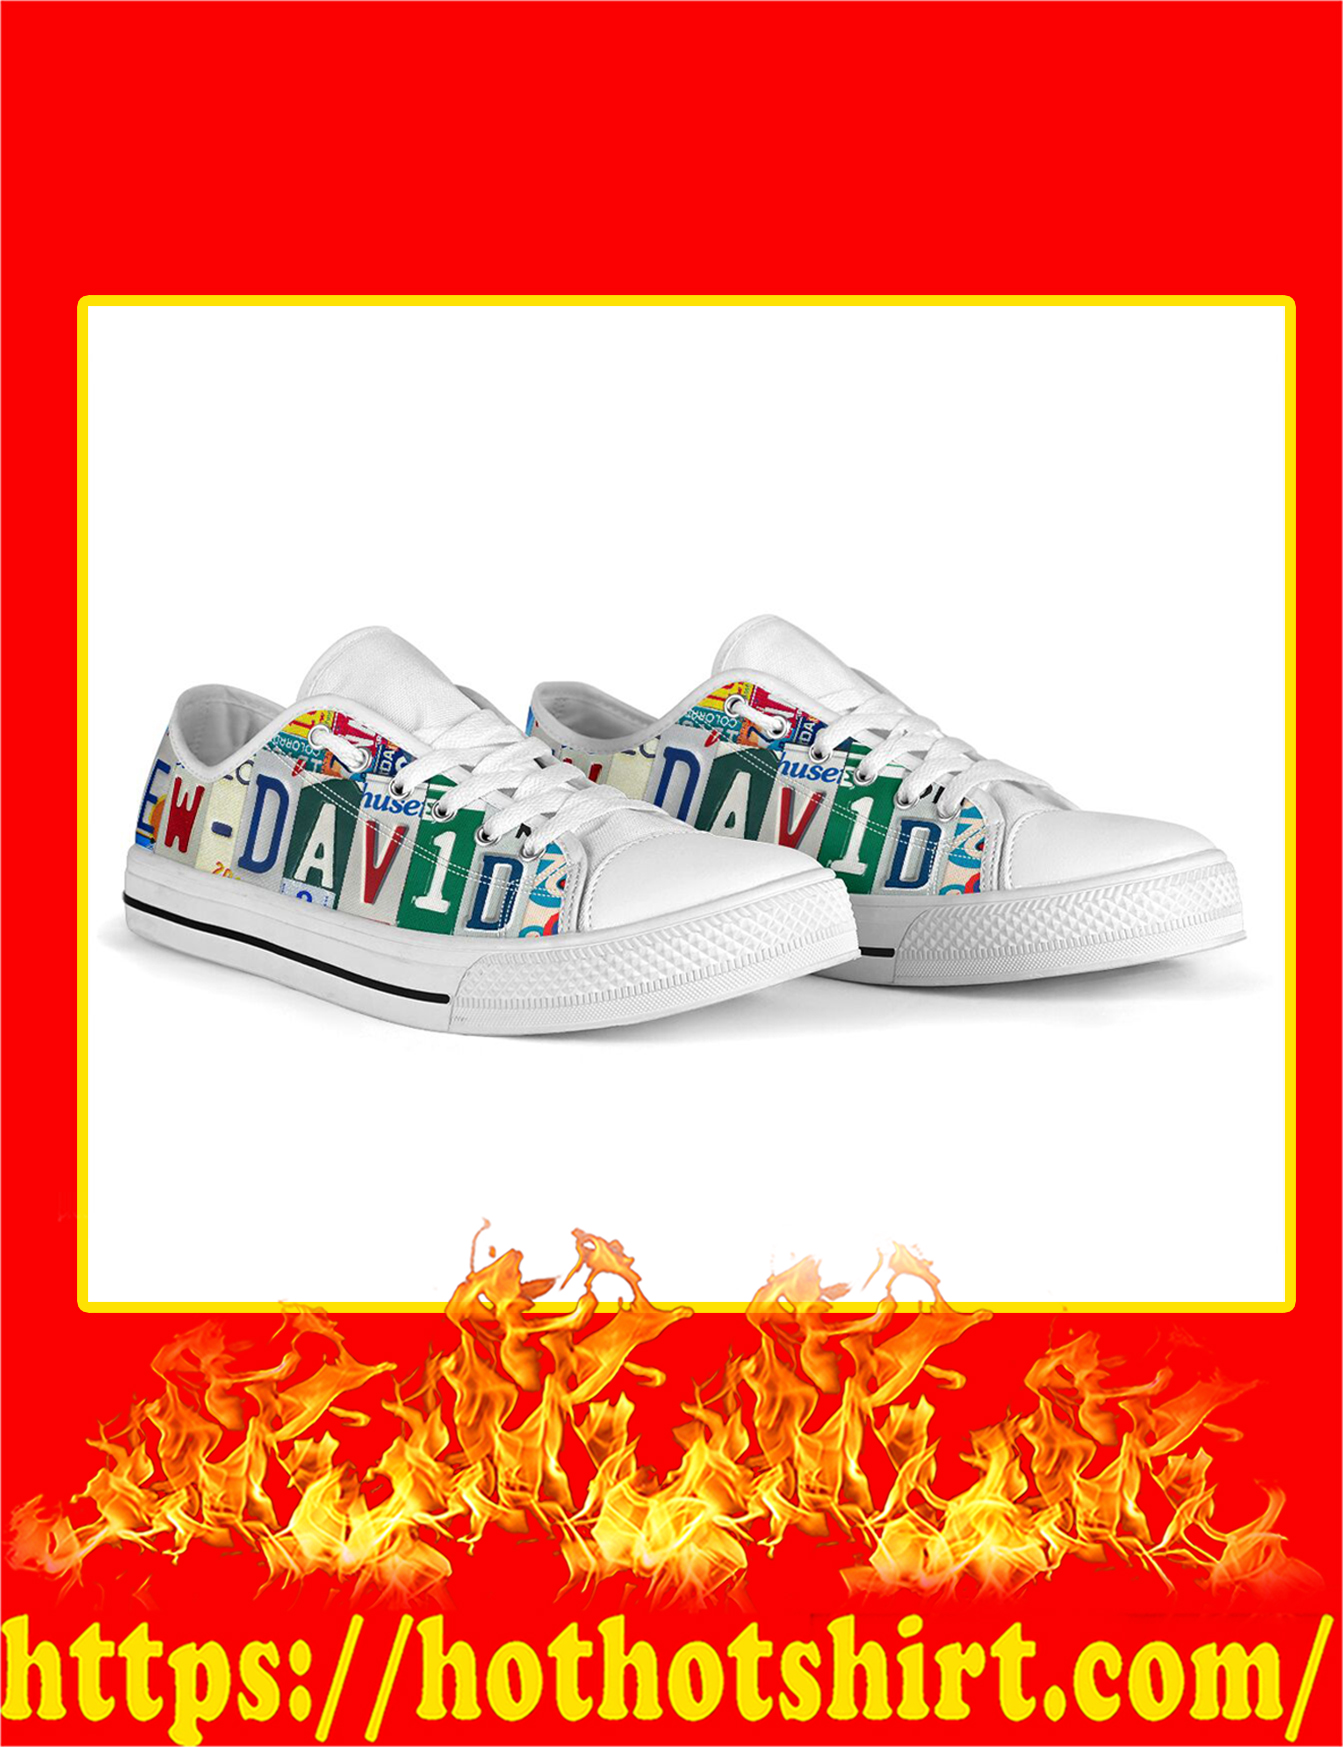 Ew David Low Top Shoes - Pic 3